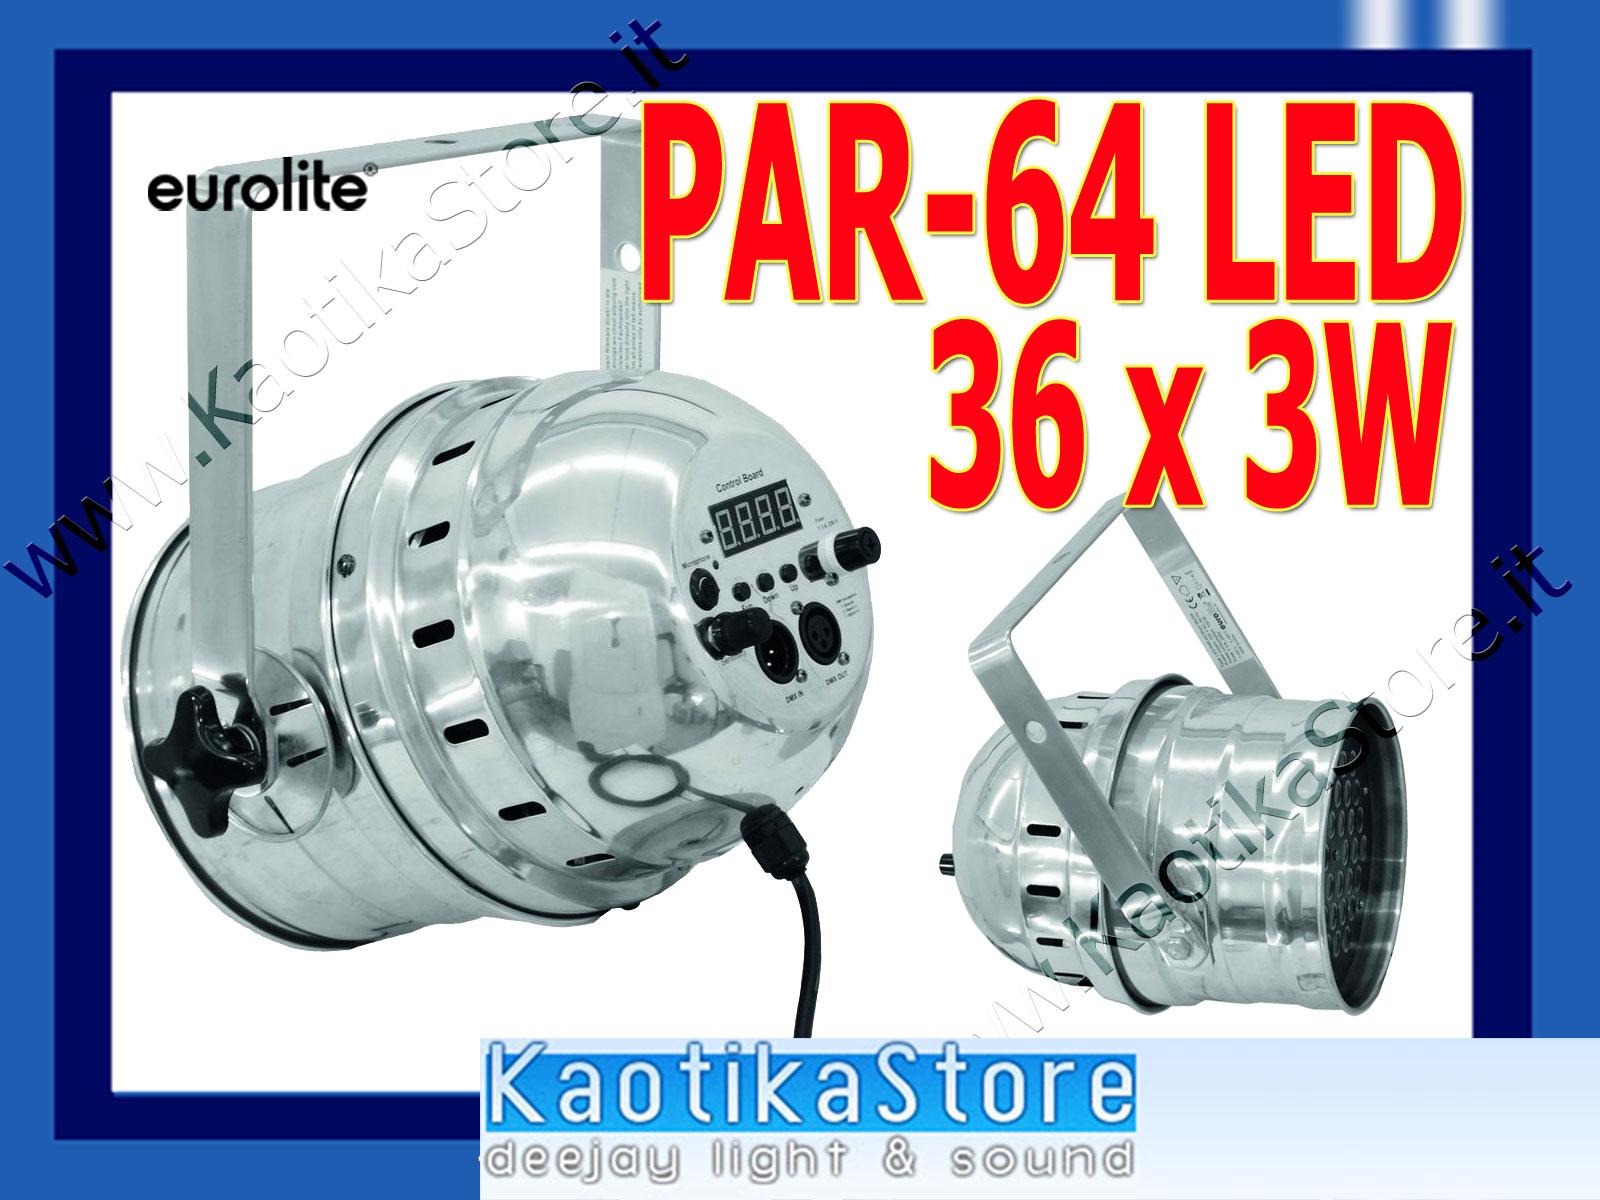 Dettagli su FARO LED 36x3W PAR64 LED PAR 64 fari RGB luci PAR 64 luce